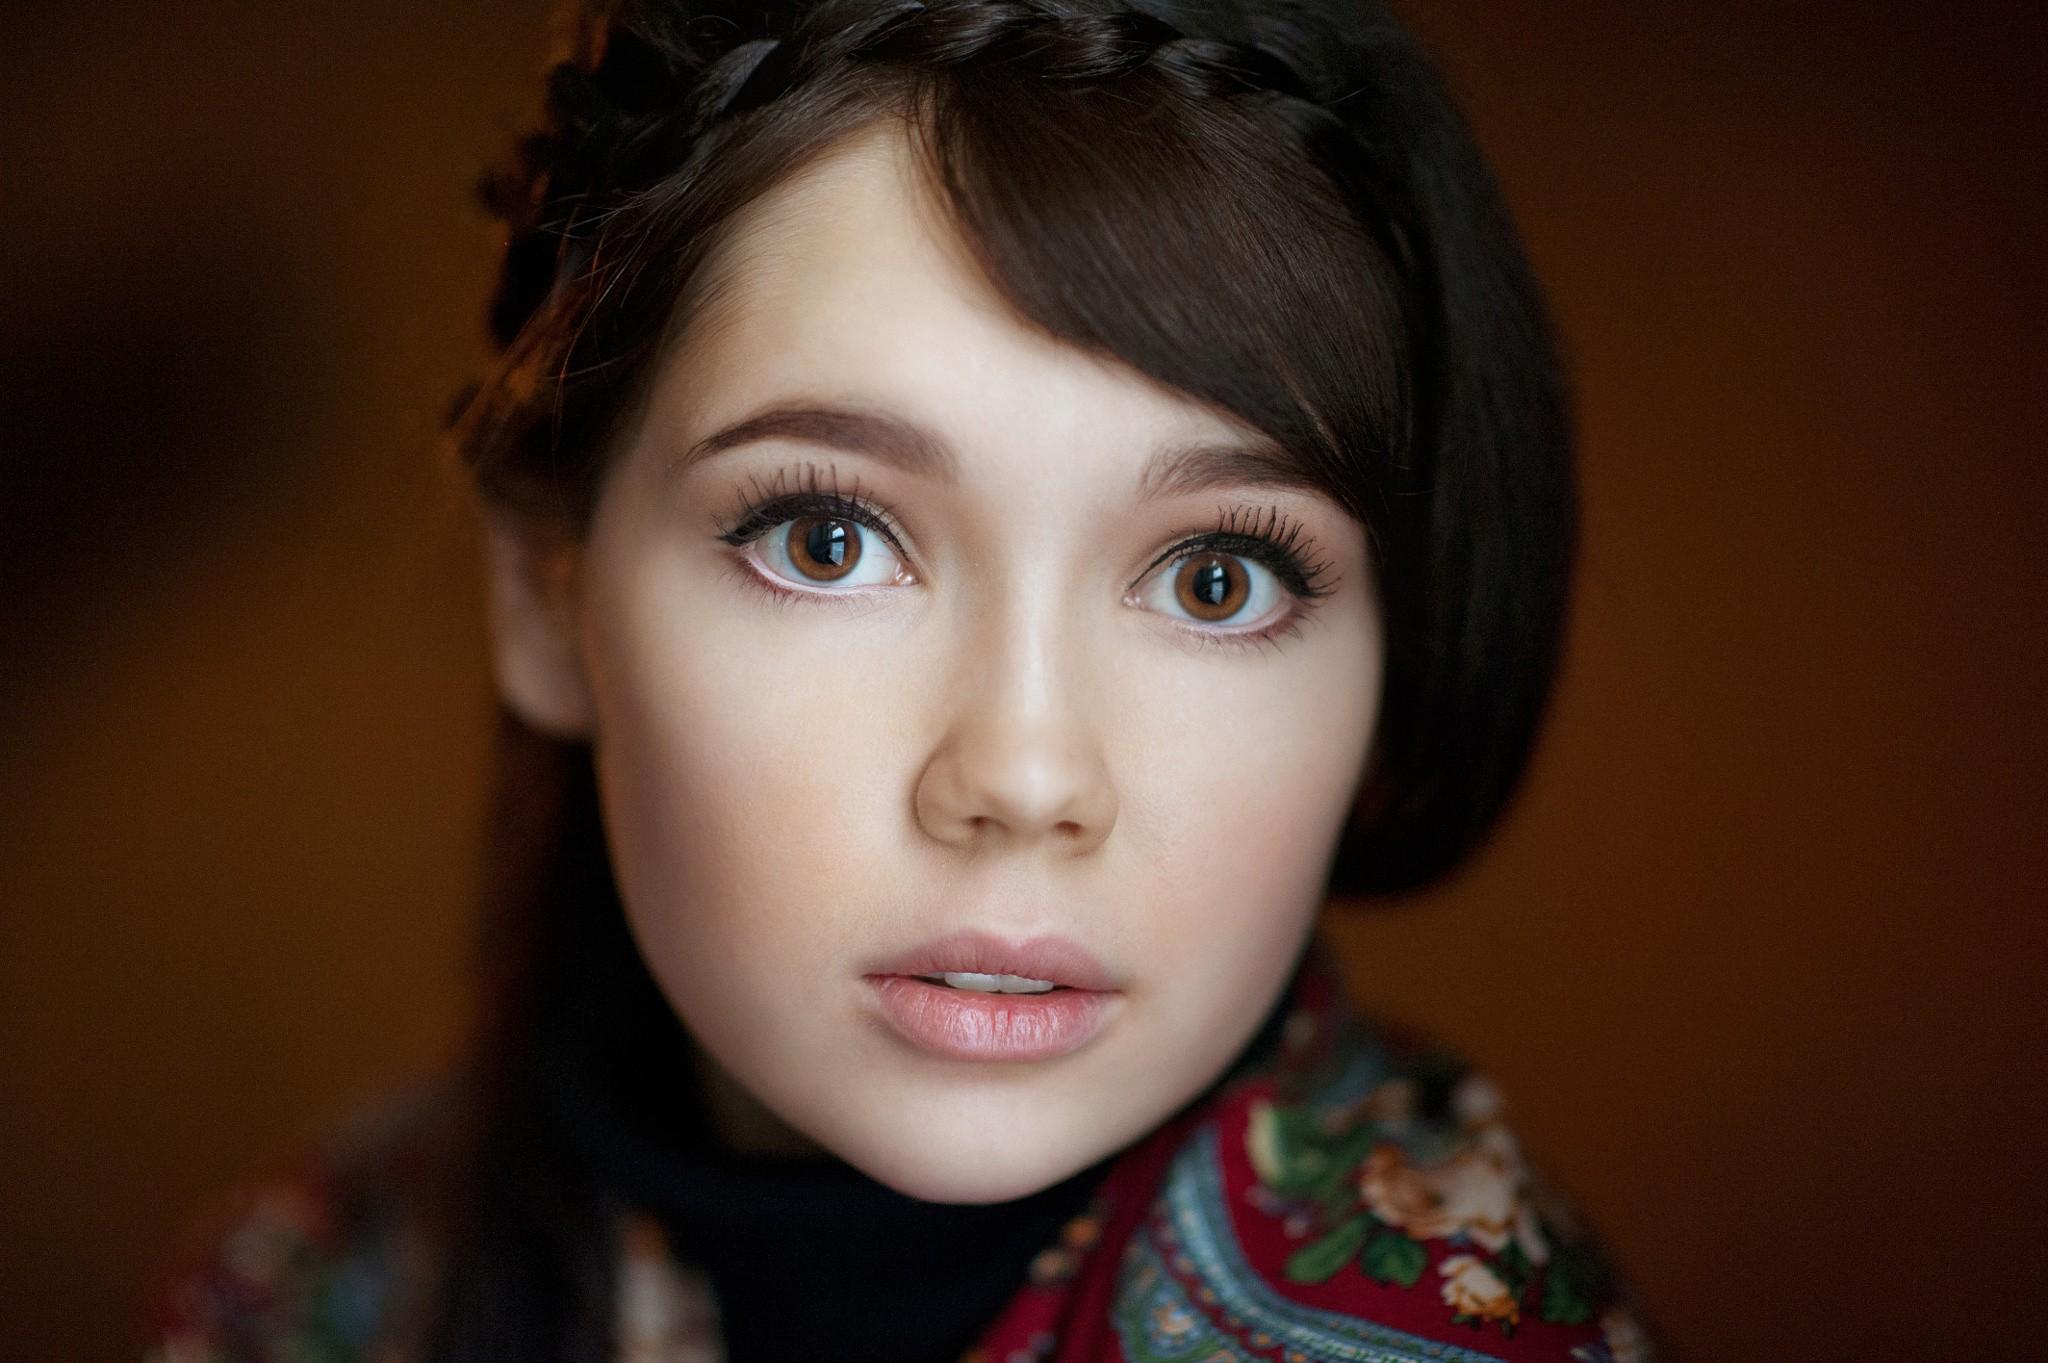 People 2048x1363 Ekaterina Ermakova women face portrait